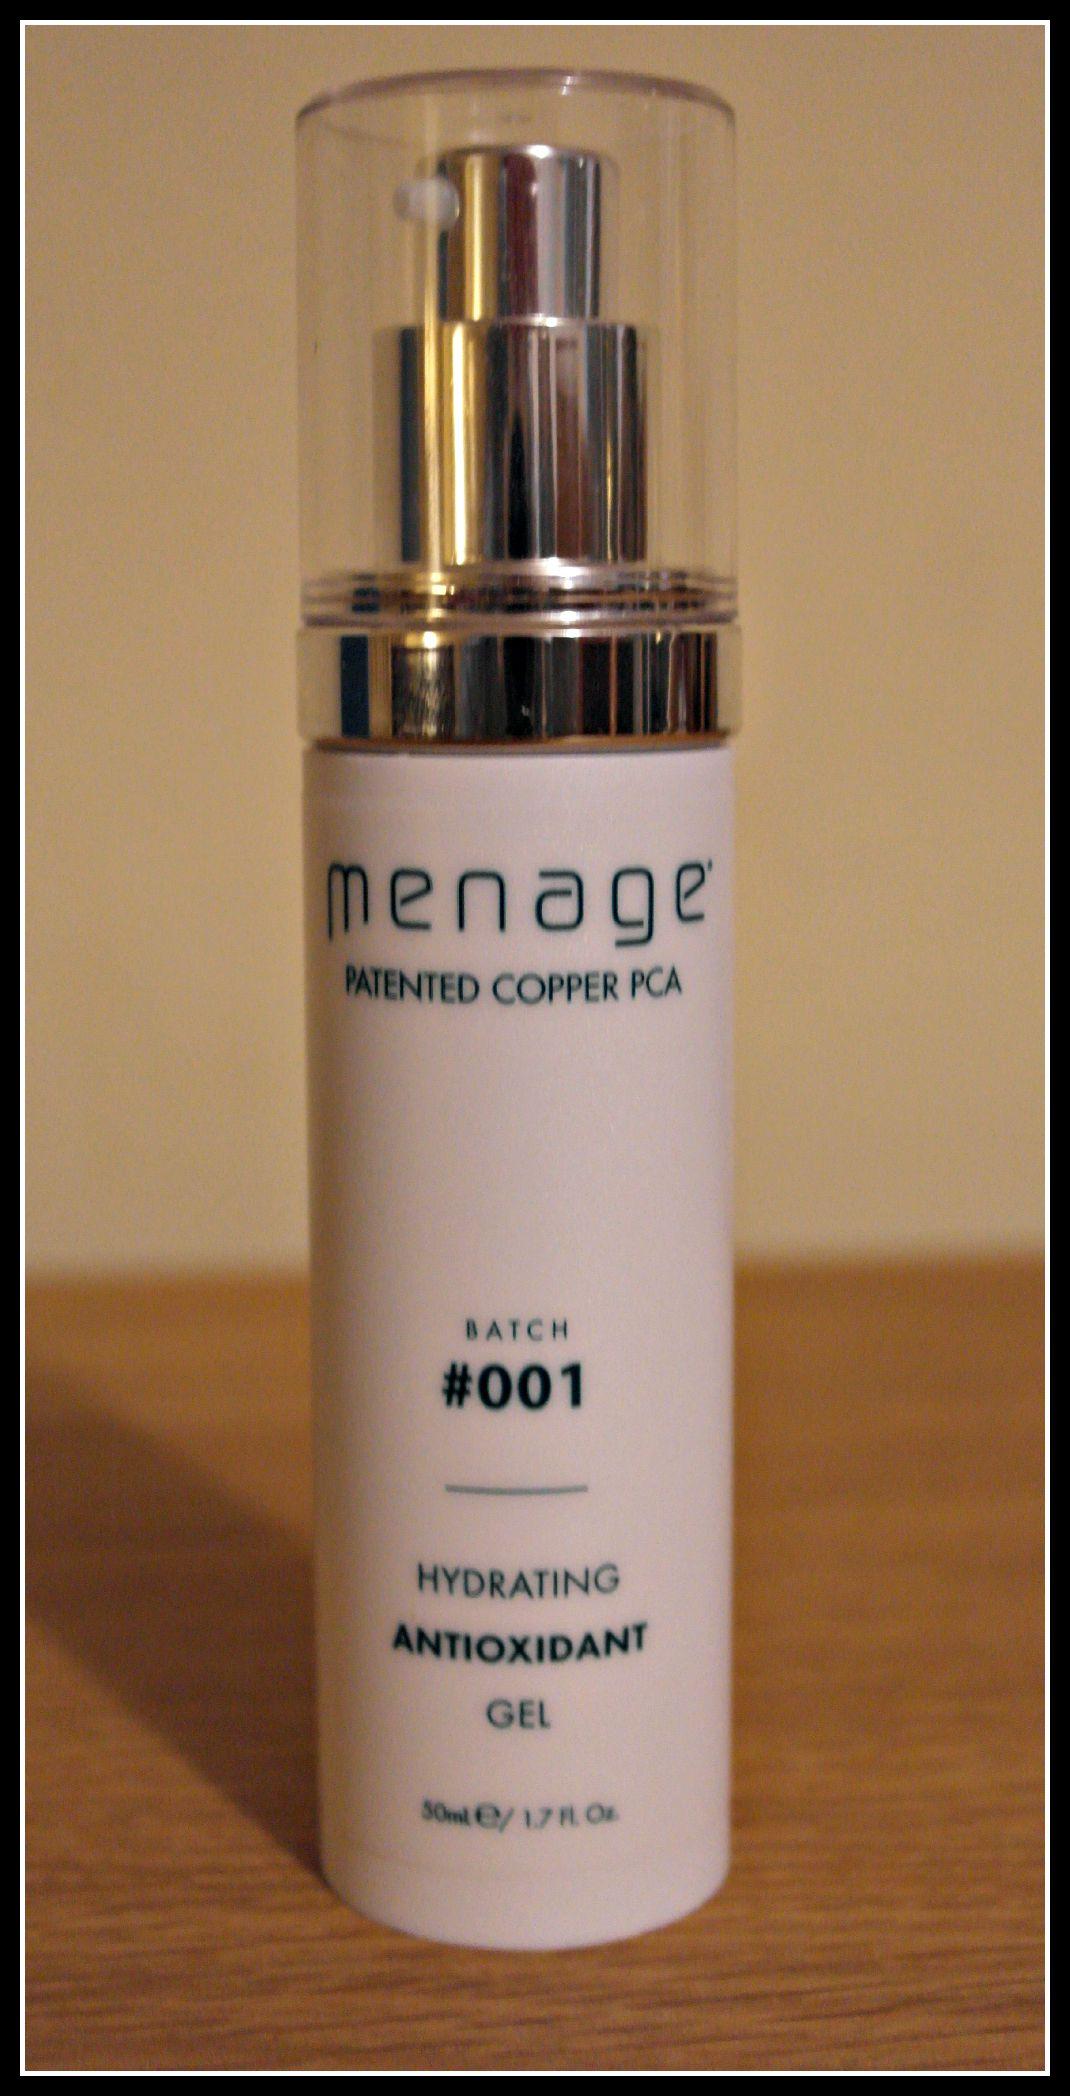 Menage moisturiser for men Batch #001